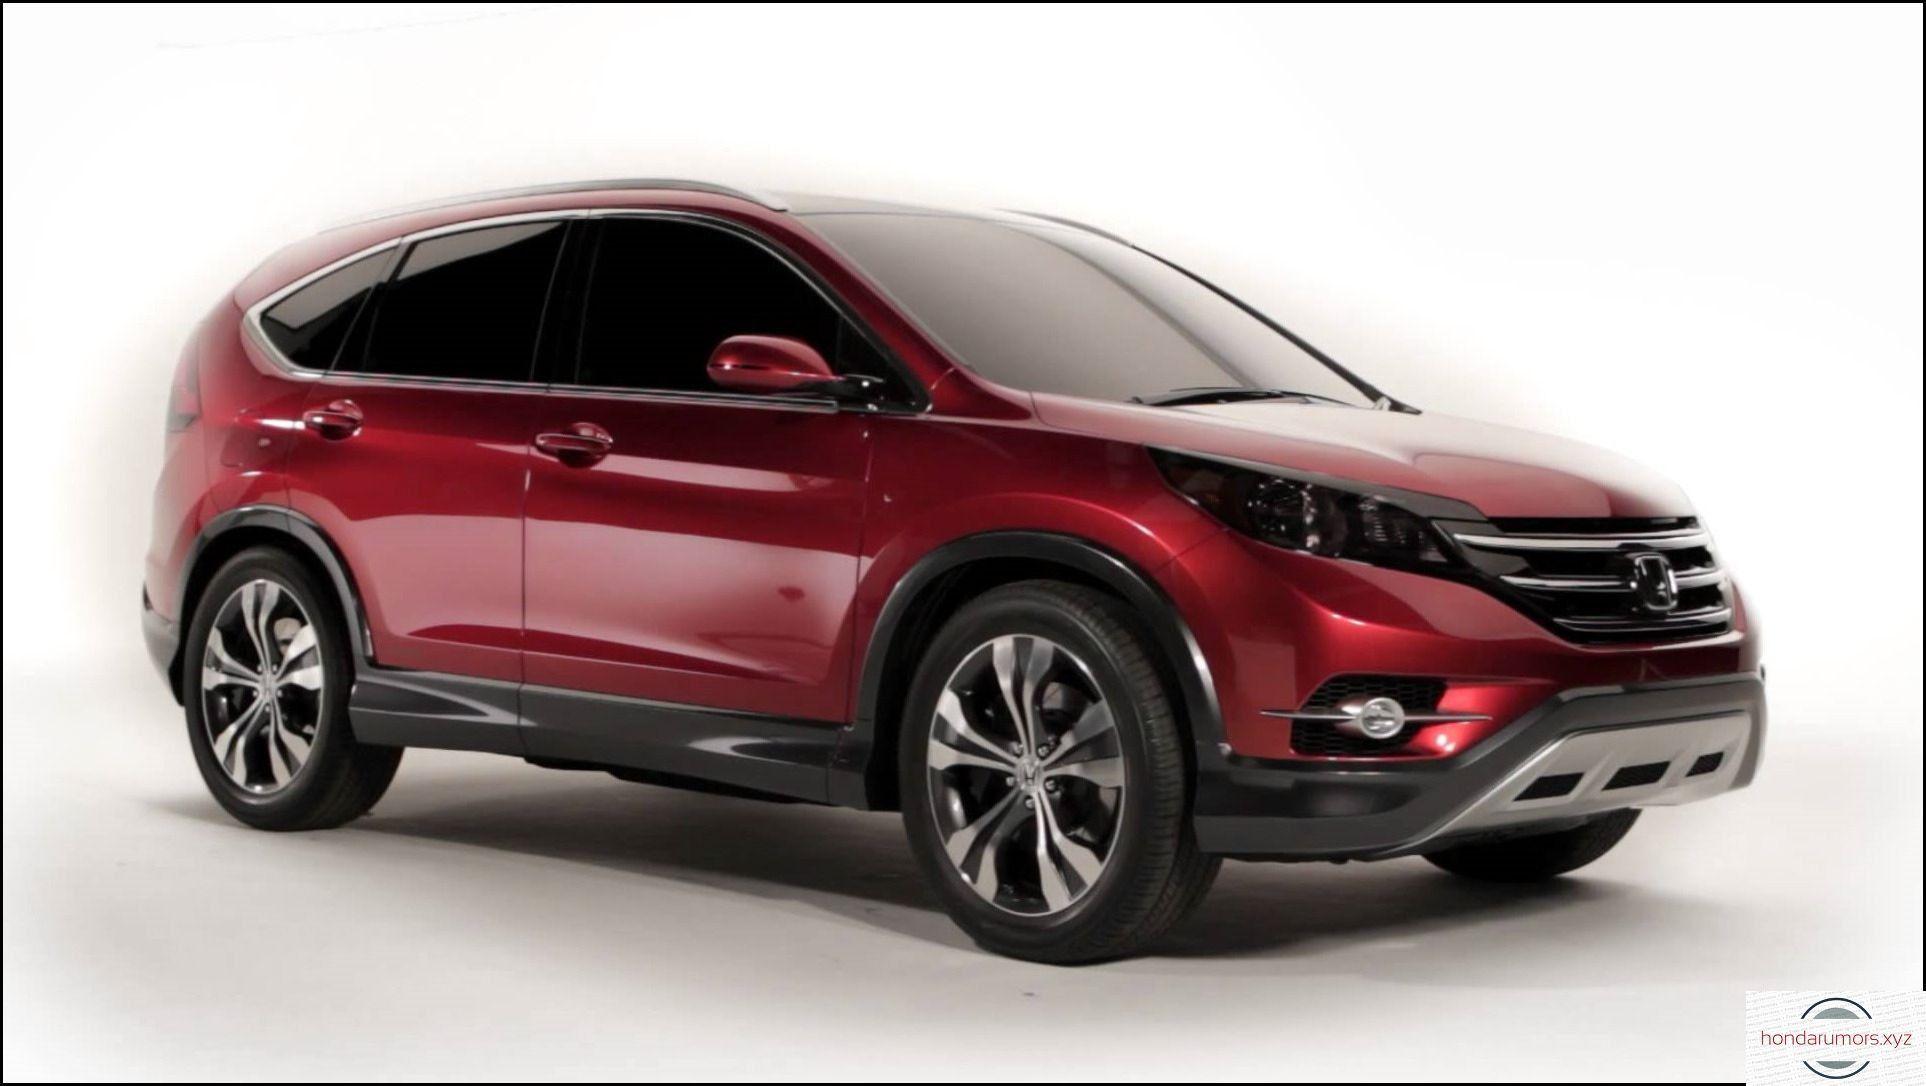 2020 Honda Crv Redesign New Release In 2020 Honda Cars Honda Crv Honda Hrv